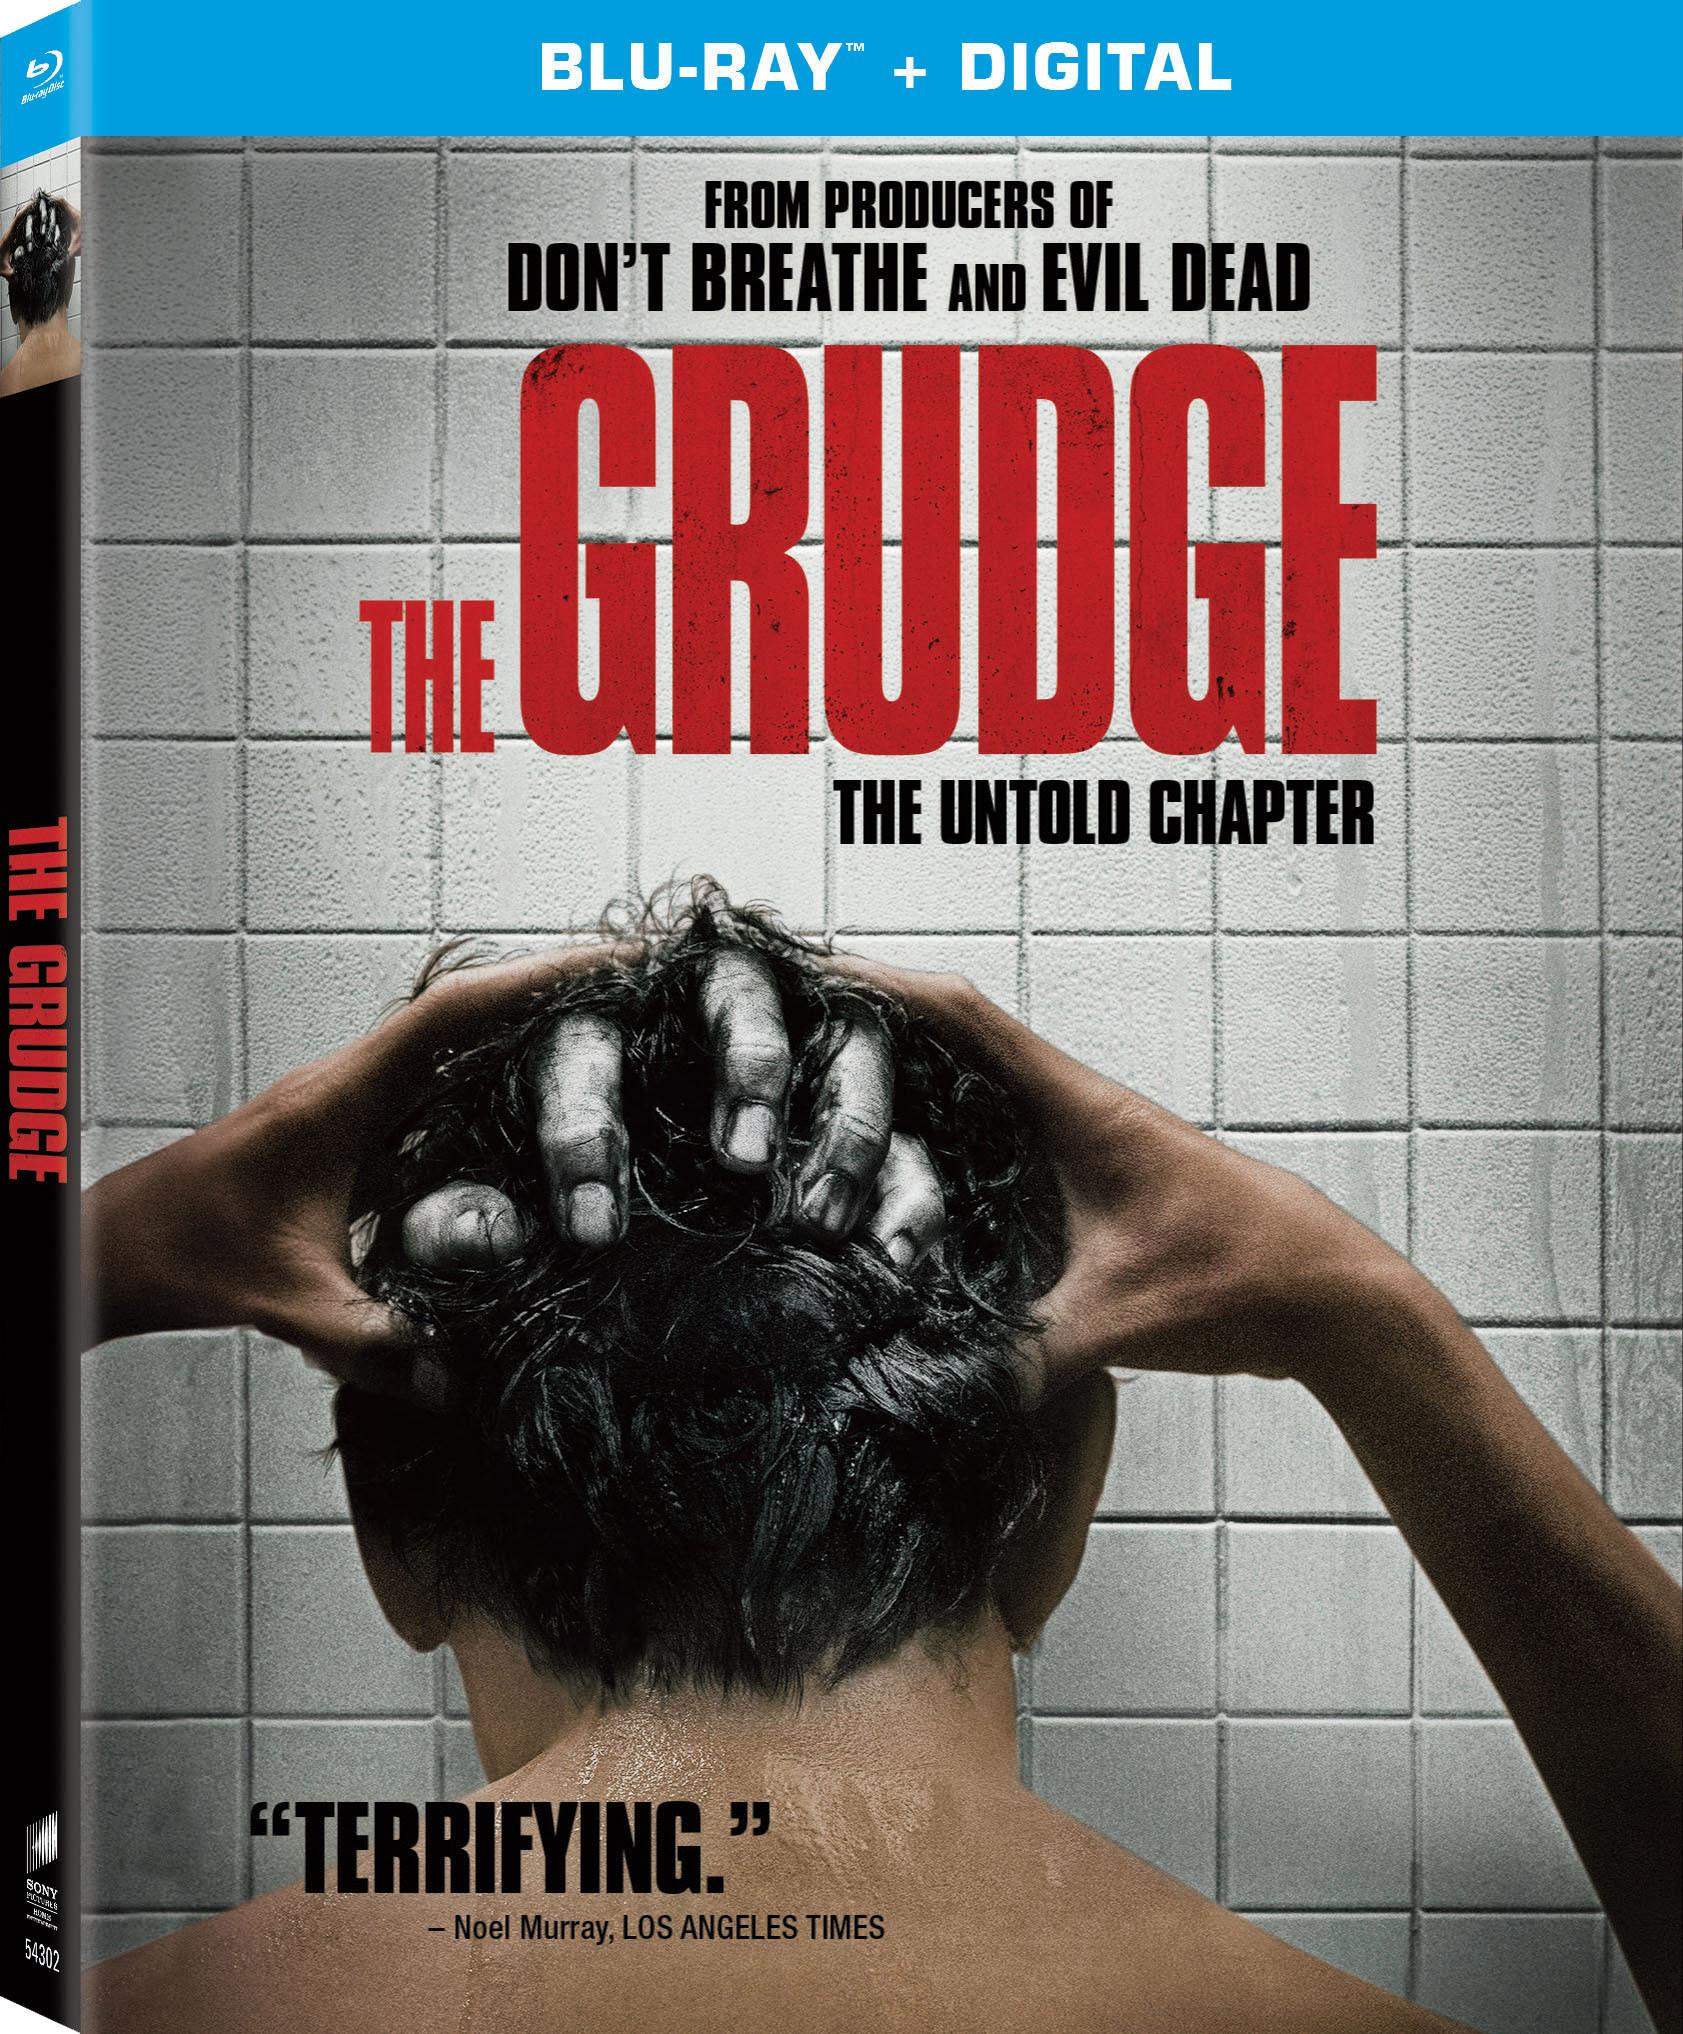 Halloween 2020 Alternate Ending The Grudge' Haunts Blu ray with Alternate Ending | Halloween Daily